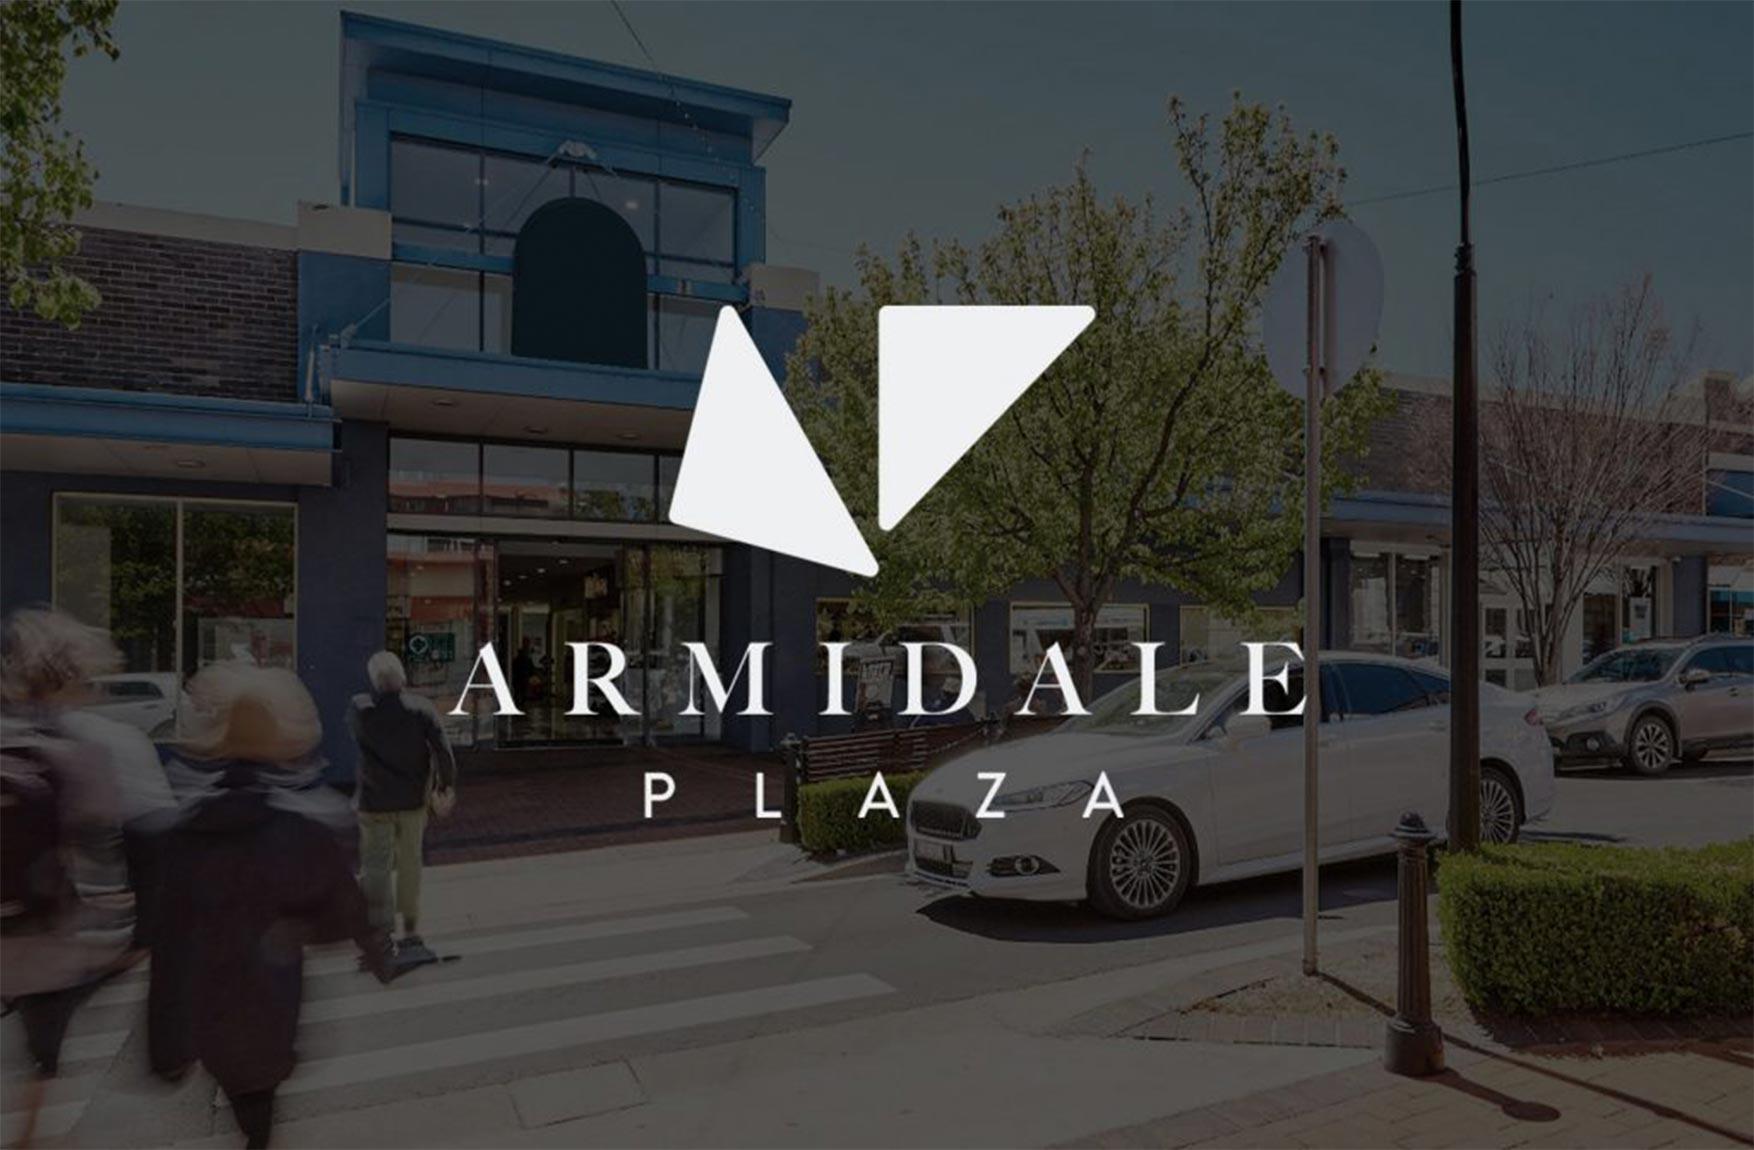 Armidale Plaza